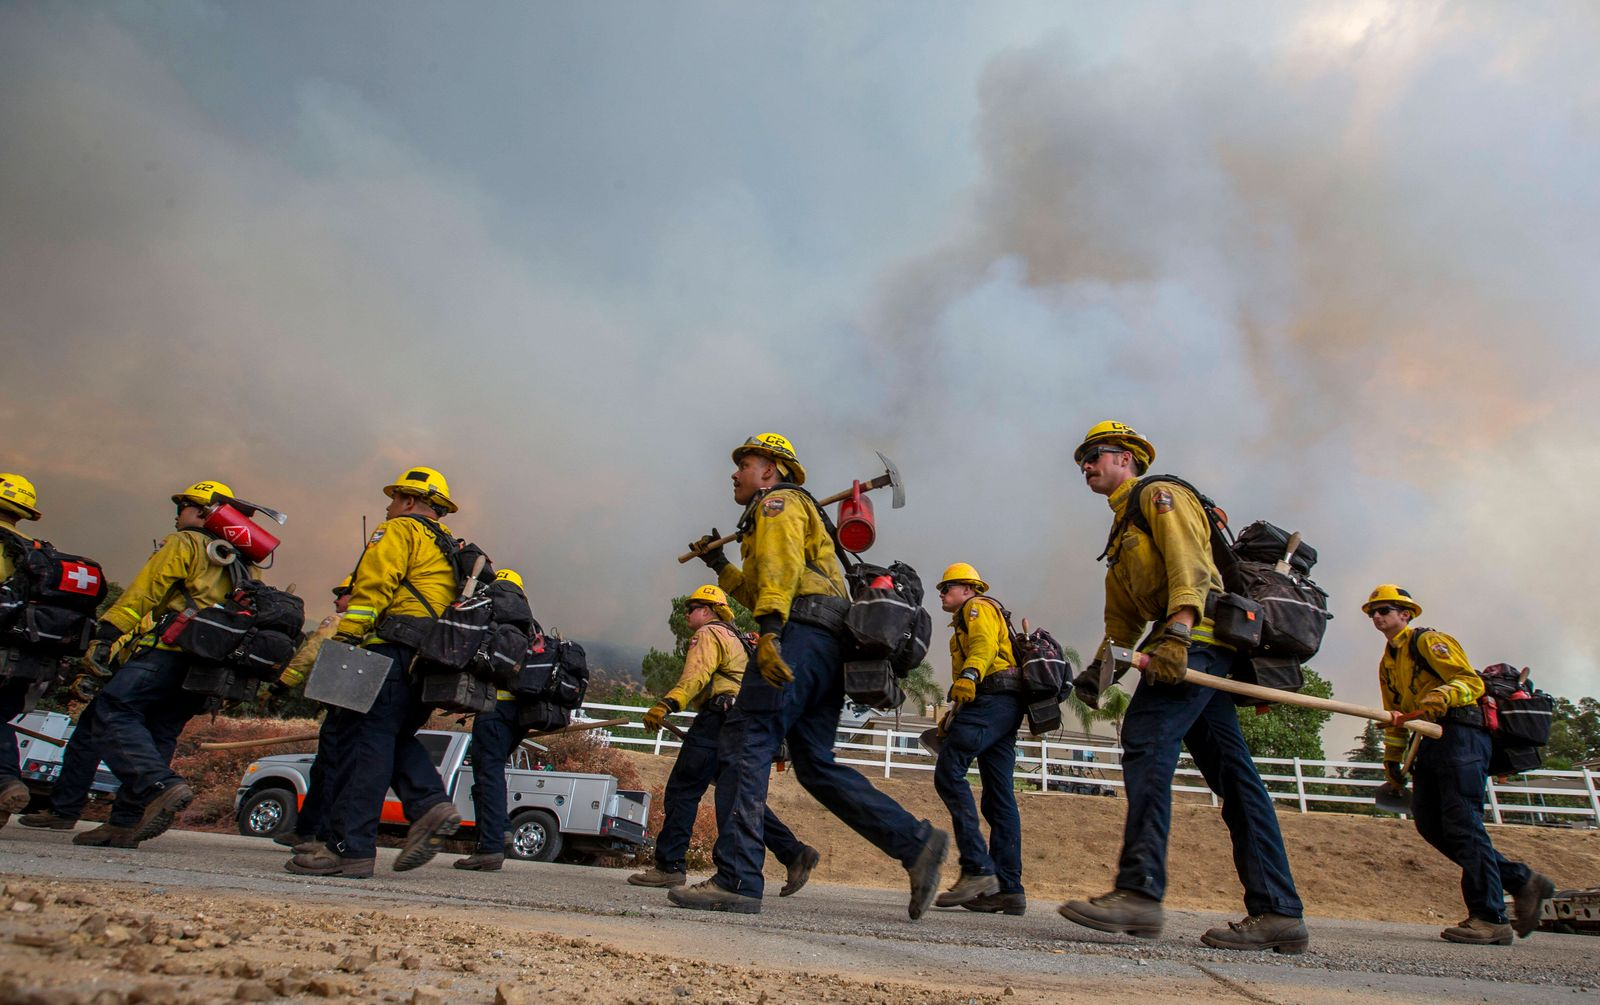 September 6, 2020, Yucaipa, California, USA: San Bernardino County firefighters brush crews C-1 and C-2 start their walk